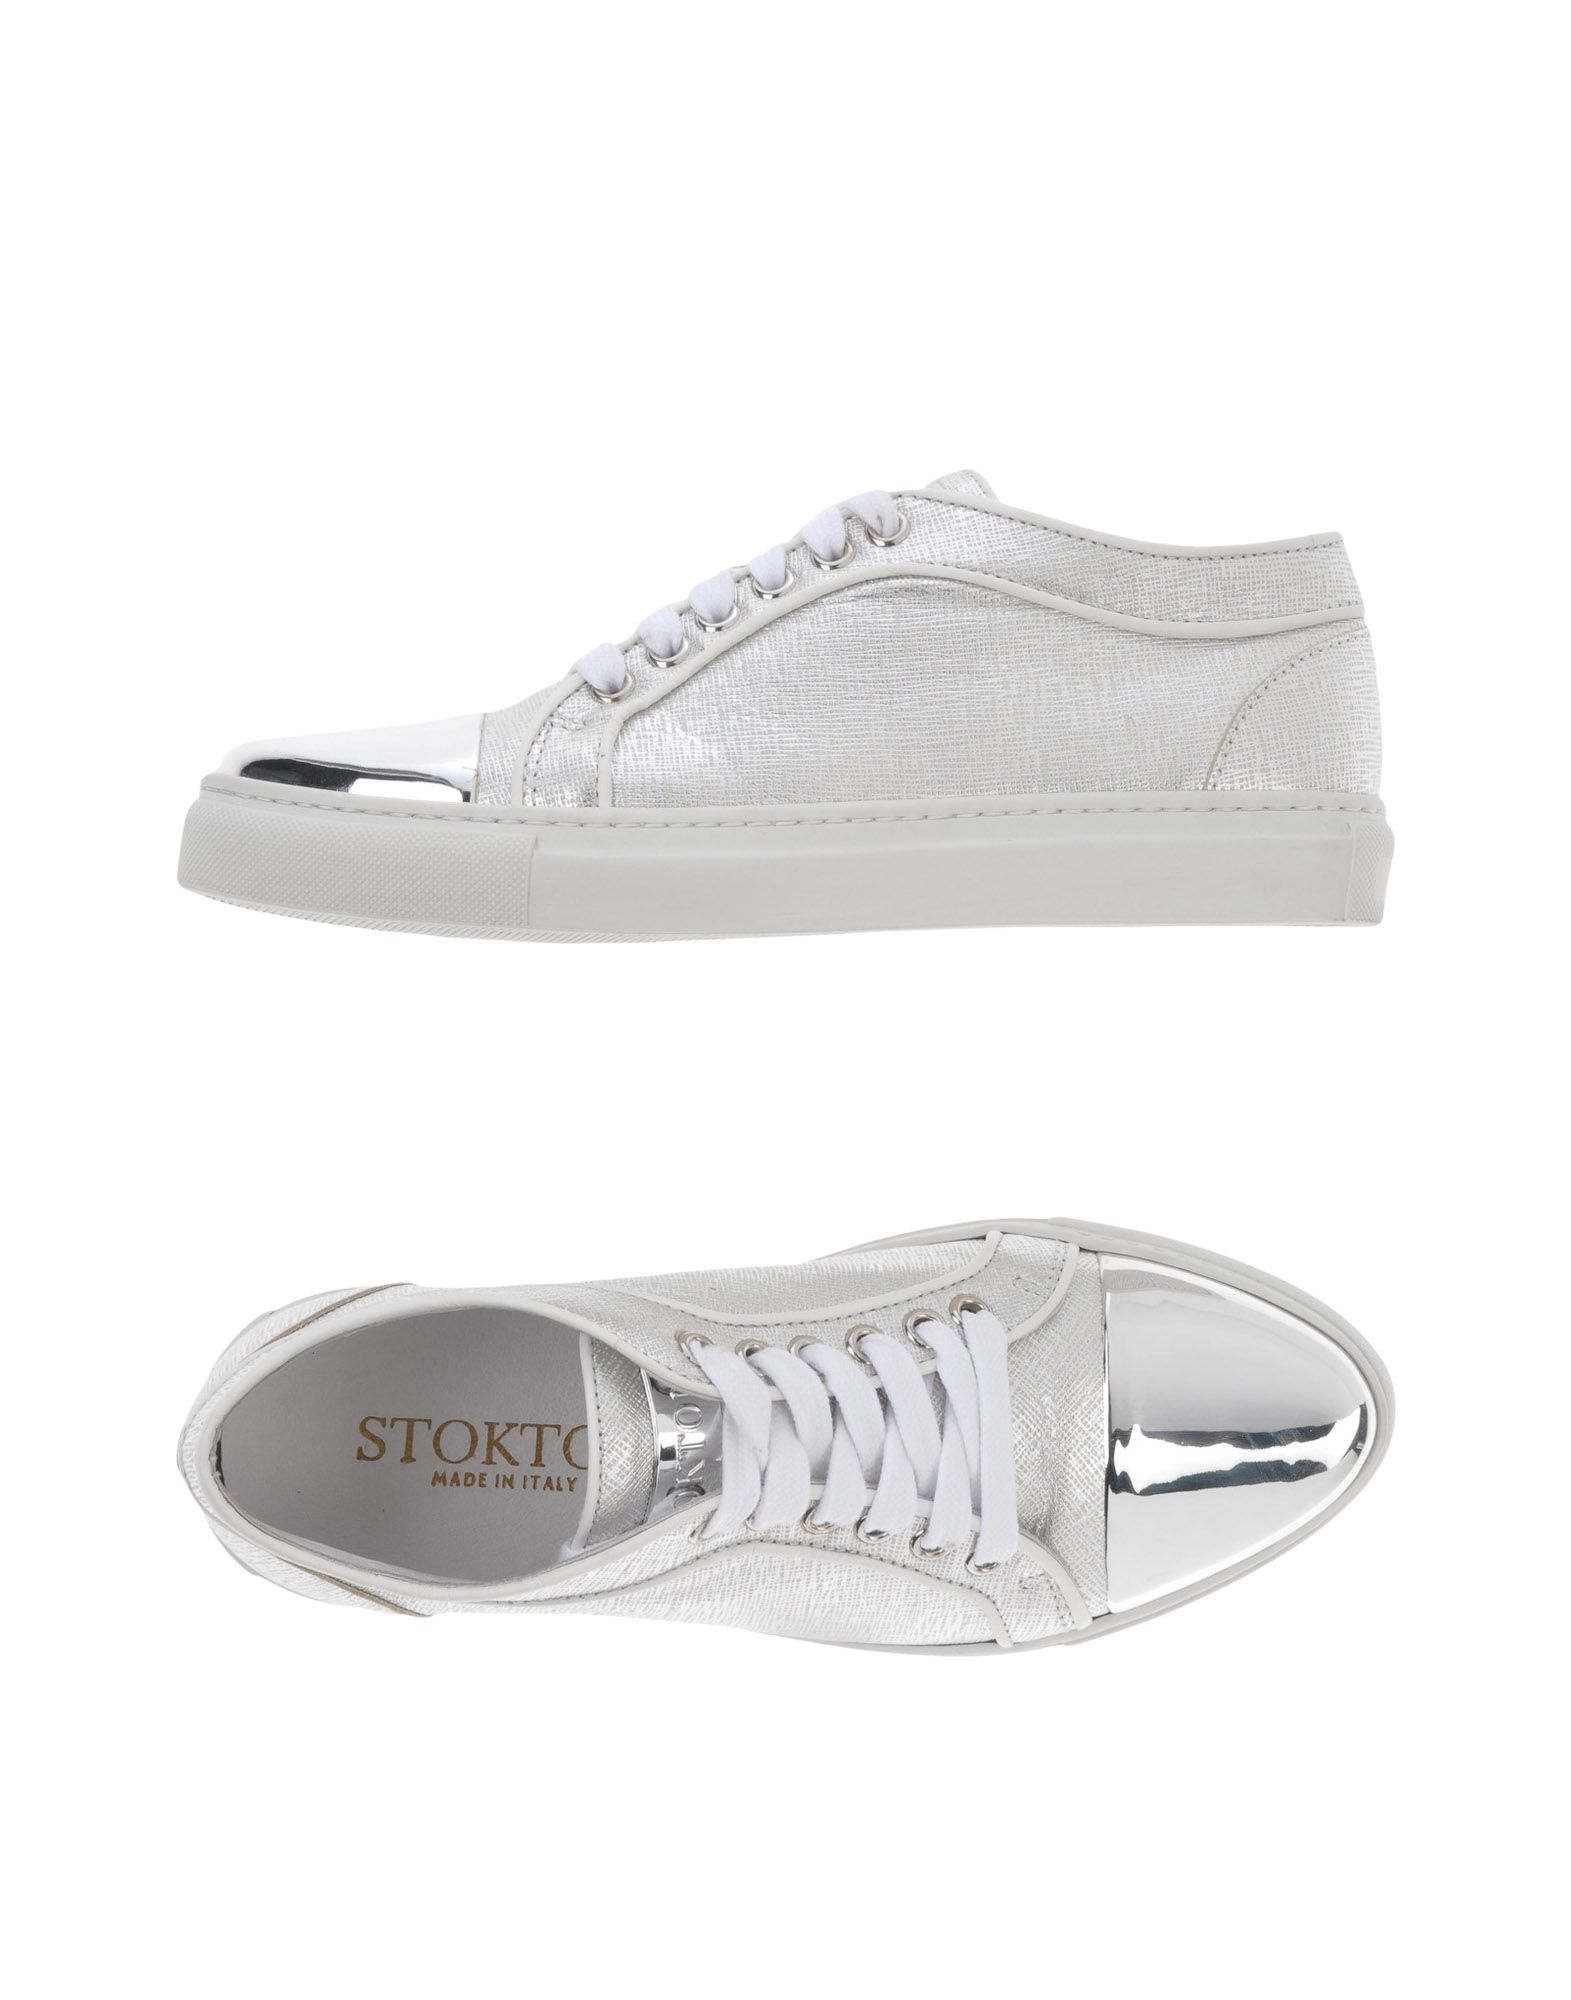 Stokton Sneakers - Women Stokton Sneakers Sneakers Sneakers online on  United Kingdom - 11457480OT 5bb9ac